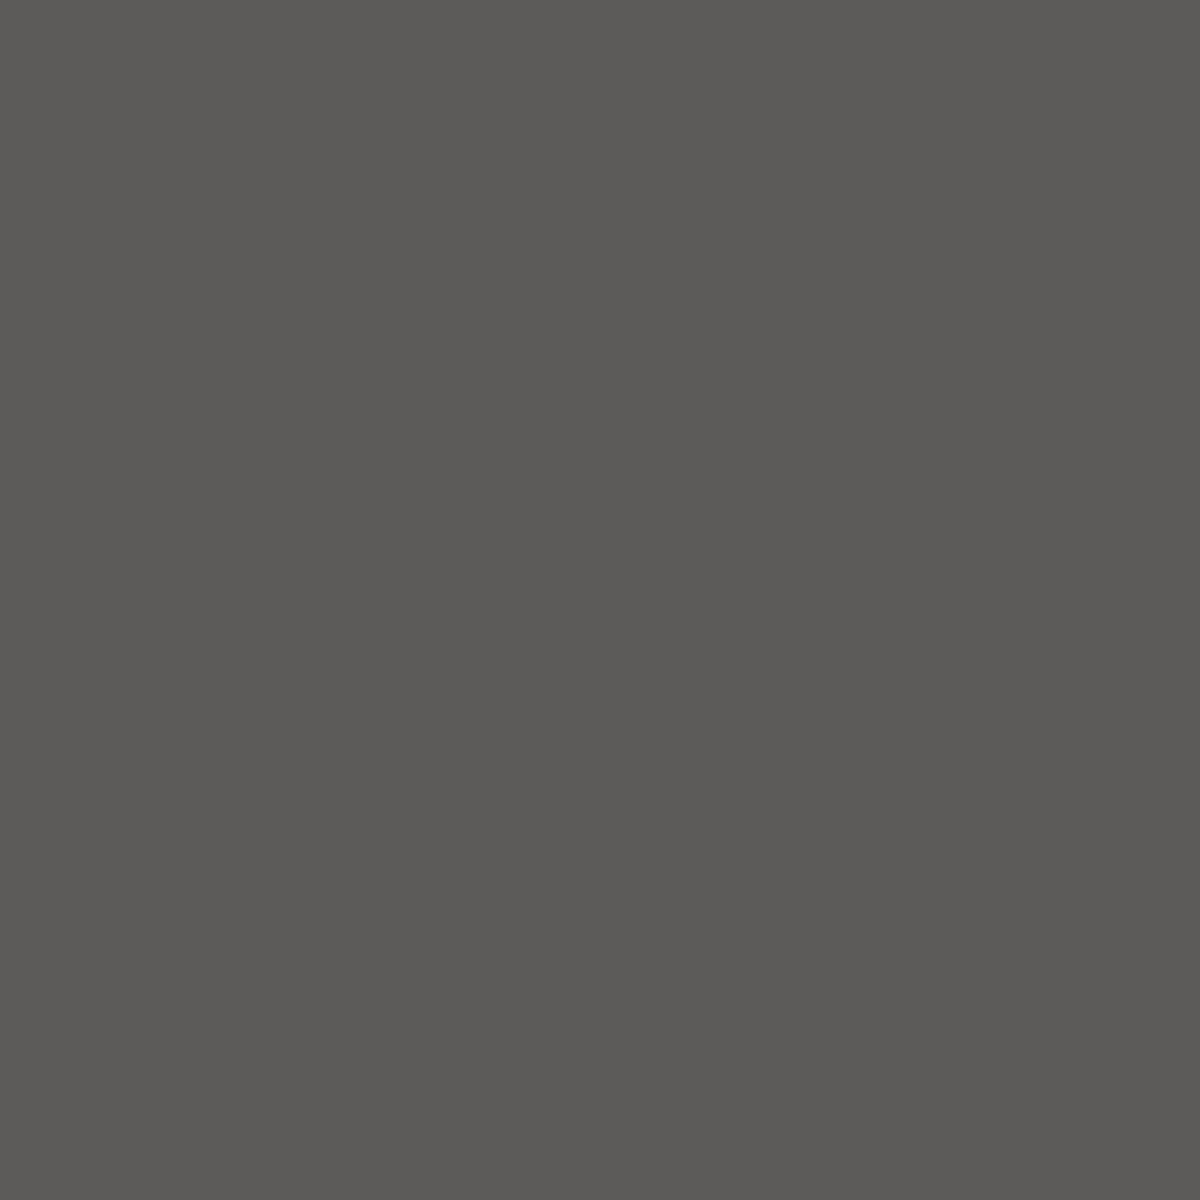 ORGANIC LINE (10ml) - PIGMENT GRAPHITE ORGANICLINE AMIEA (10 ml)